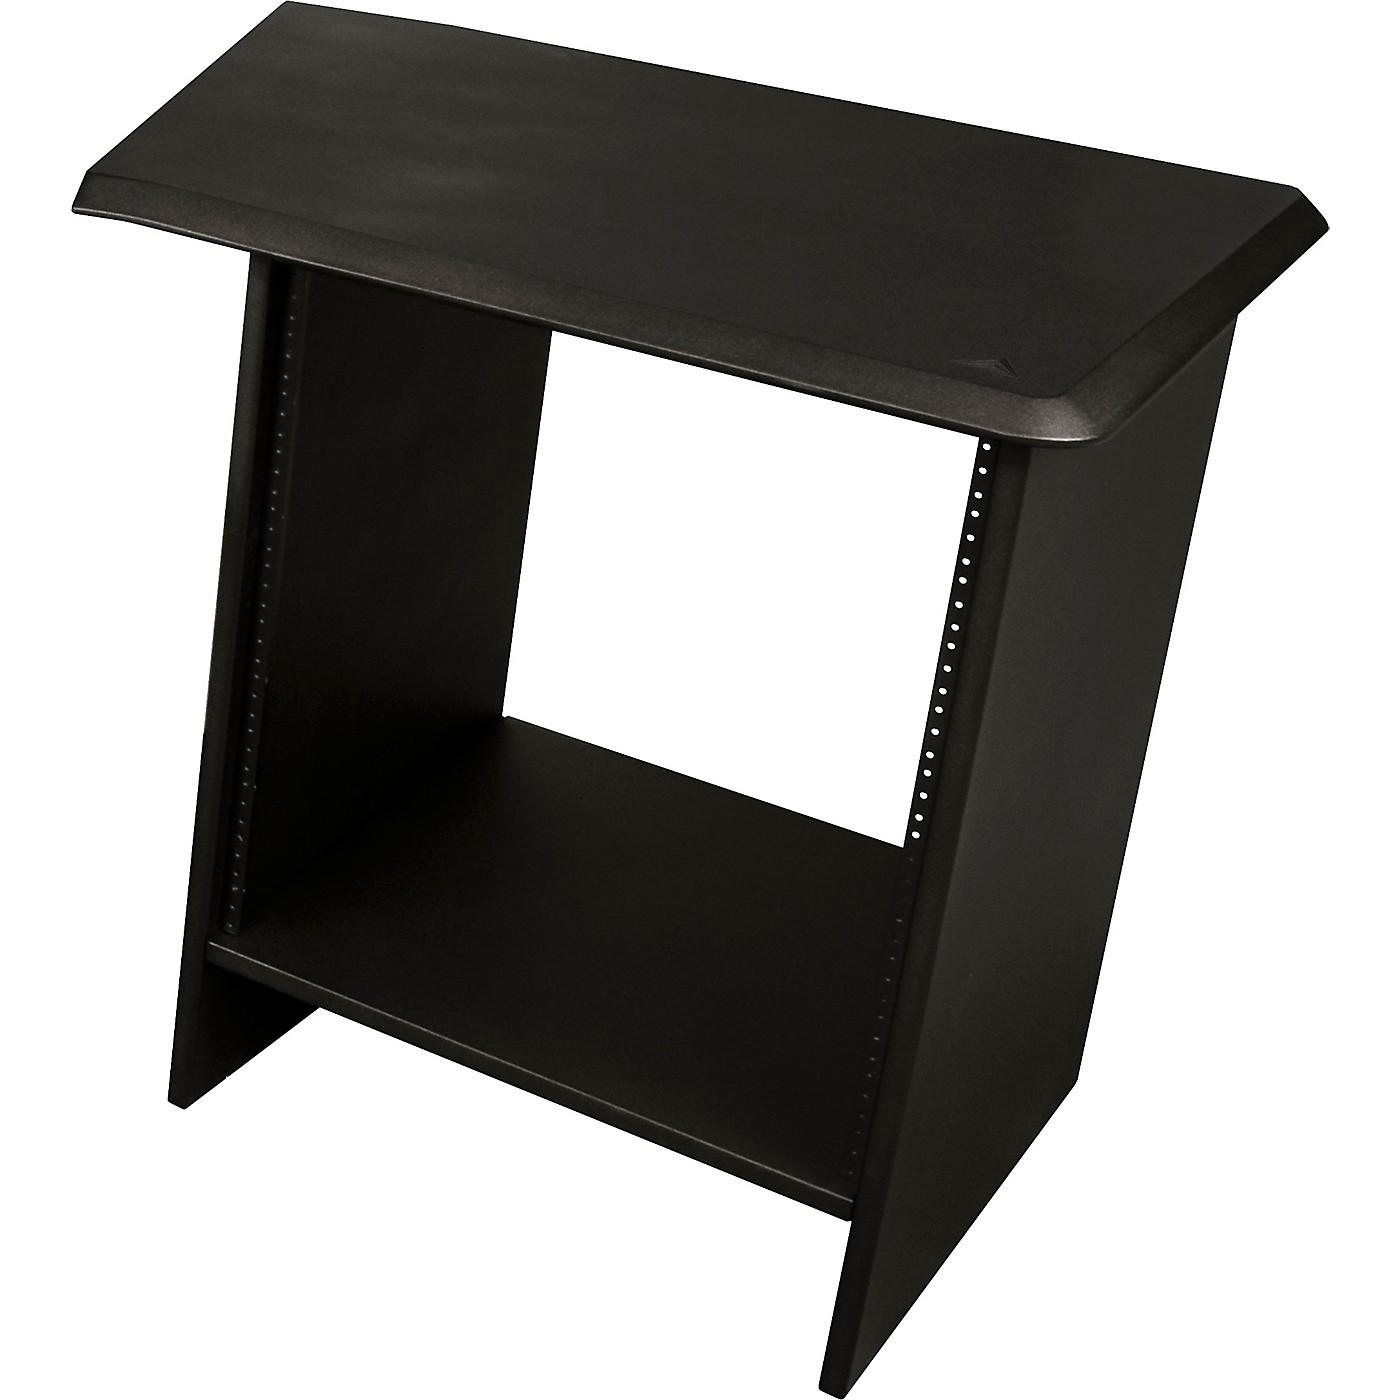 Ultimate Support NUC-R12R Nucleus Series - Studio Desk Table Top - Single 24